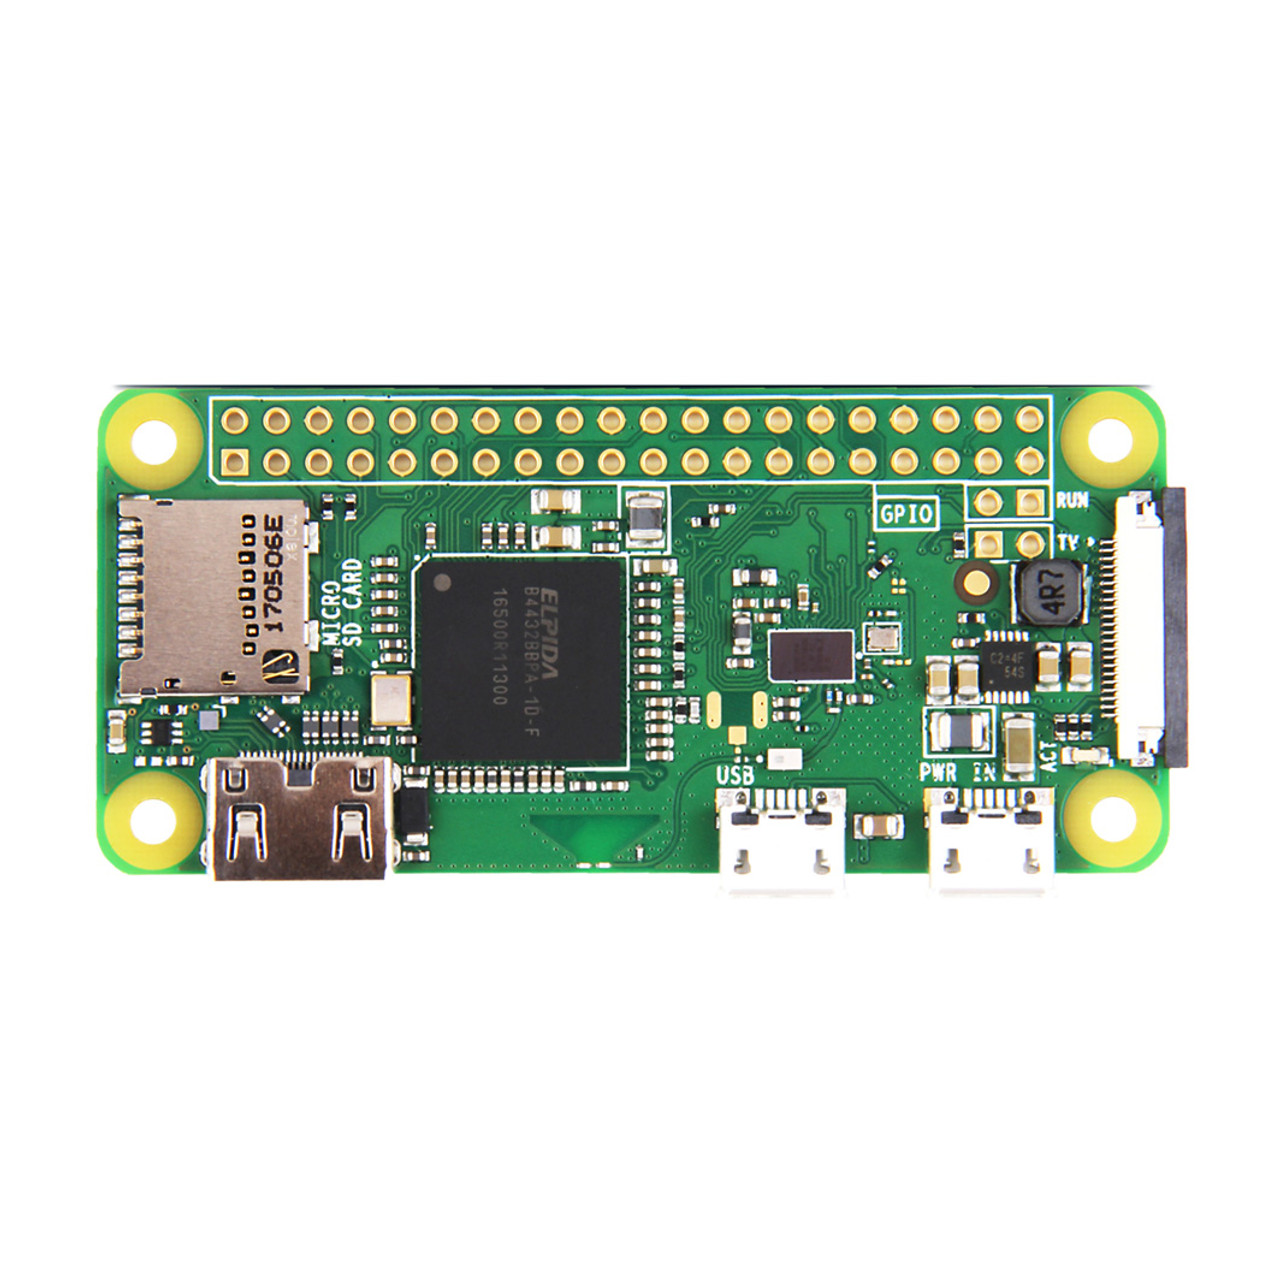 For Raspberry 3 in 1 Pi Zero W //Zero Starter Kit Accessories with HDMI Adapter